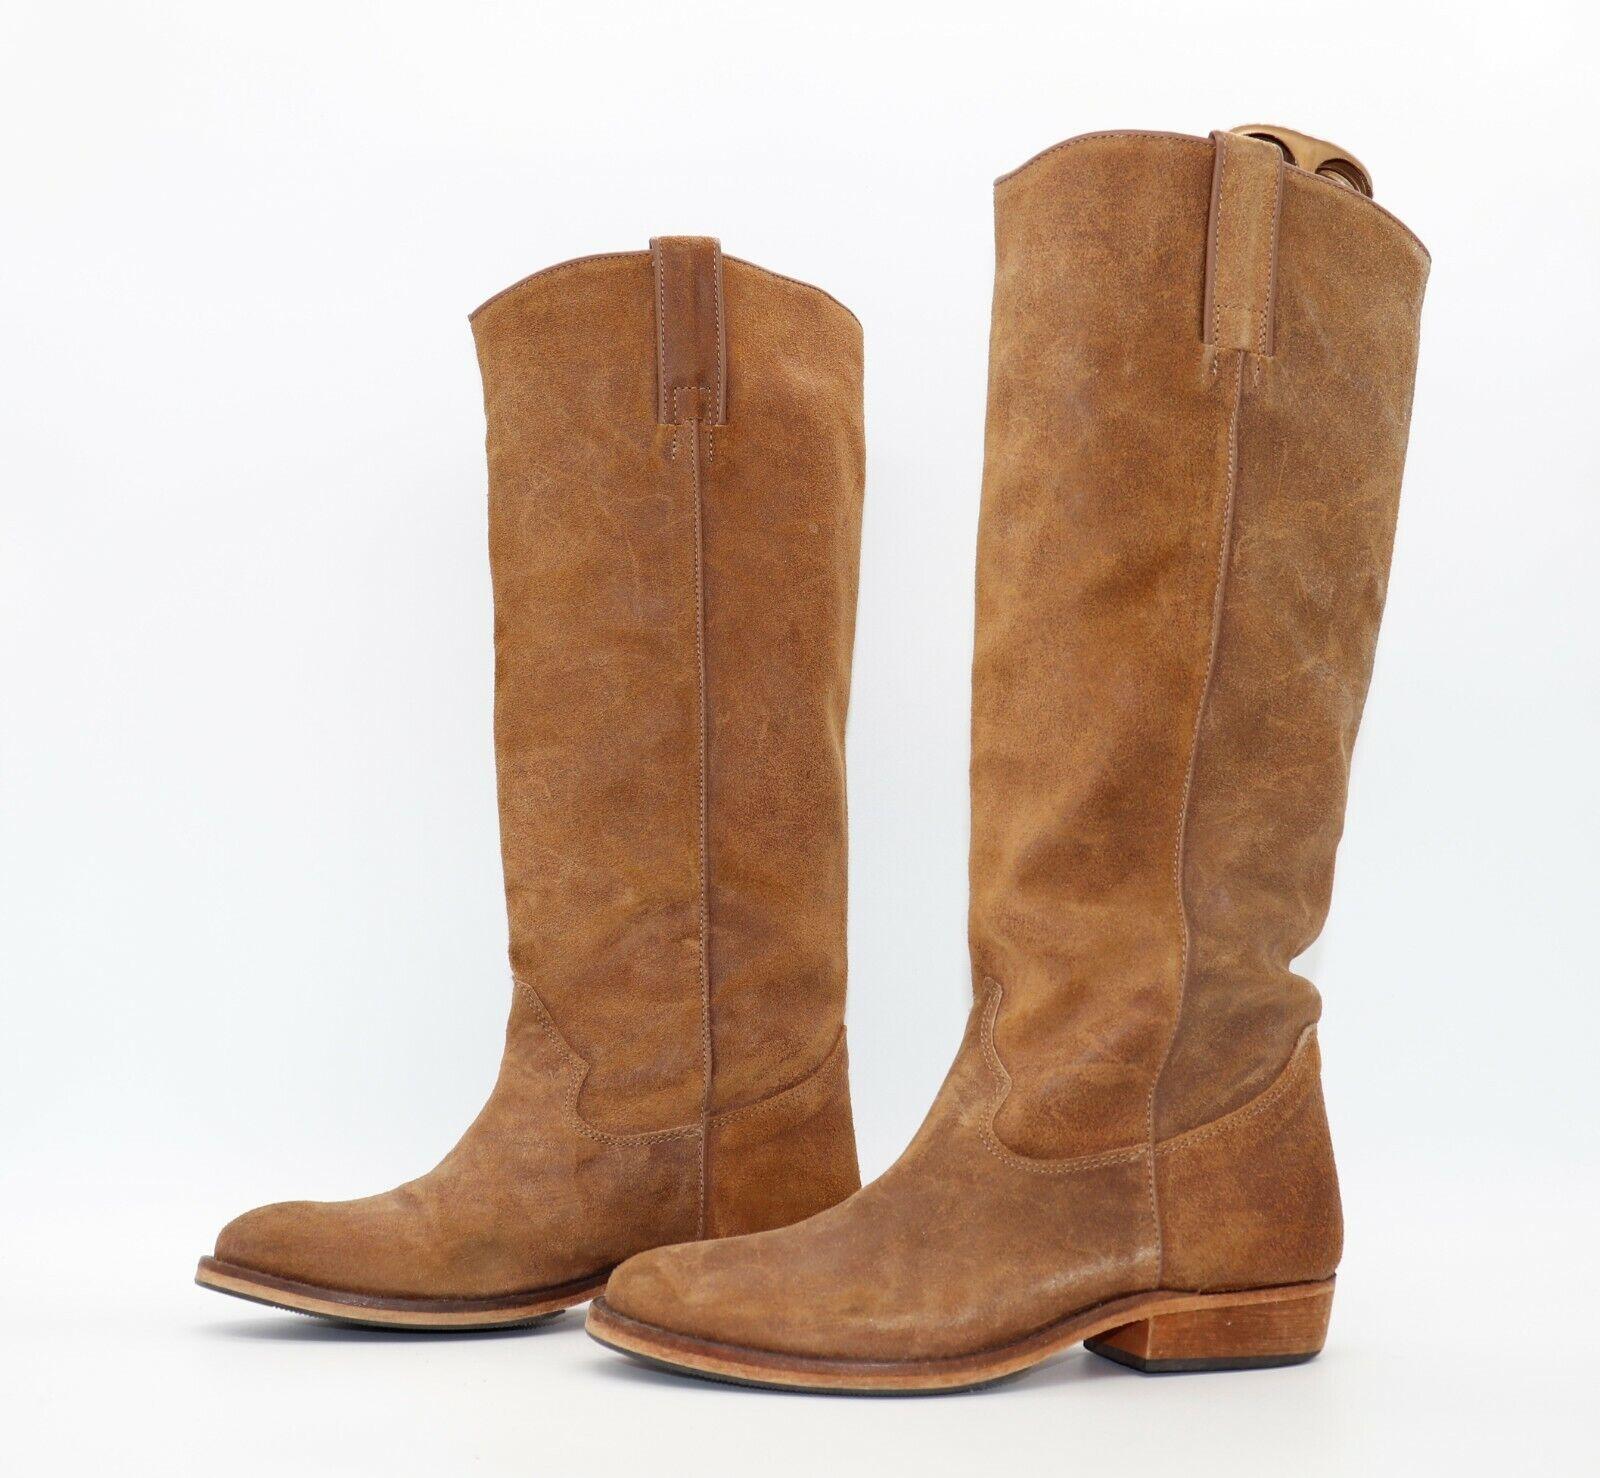 Women's Vintage COWBOY BIKER Low Heel Knee High Tan 100% Leather Boots UK6 EUR39